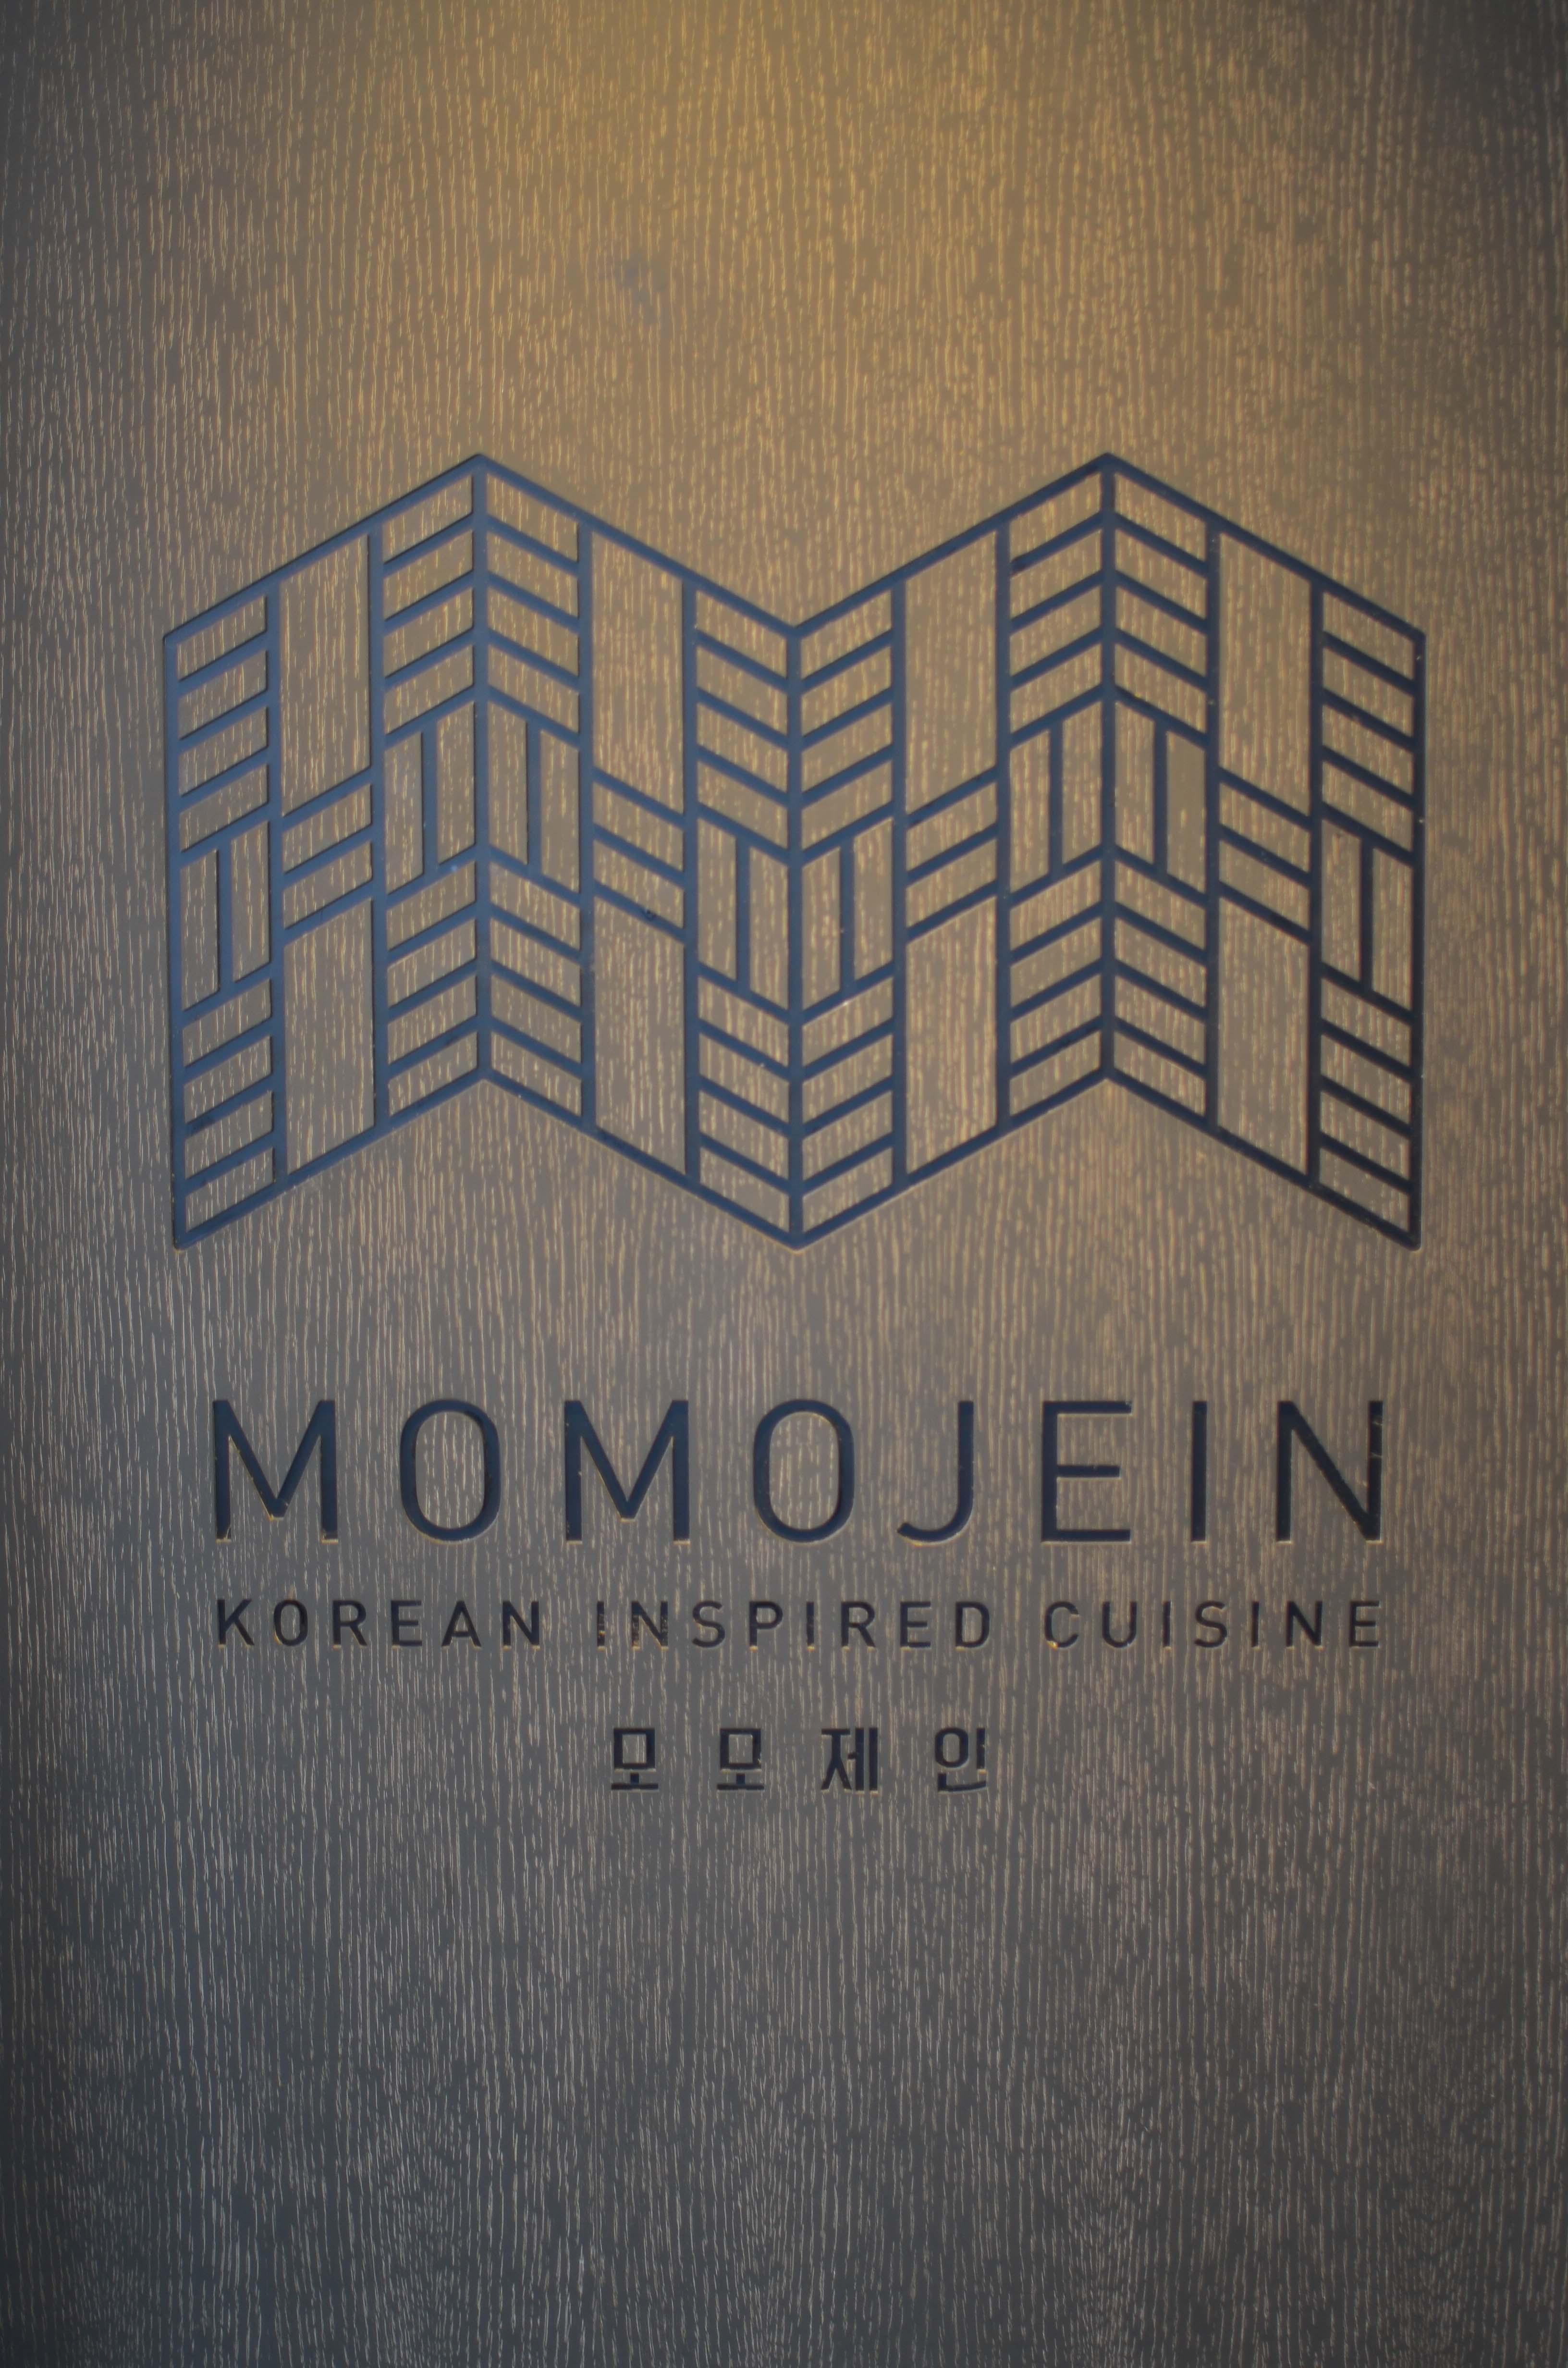 Momojein